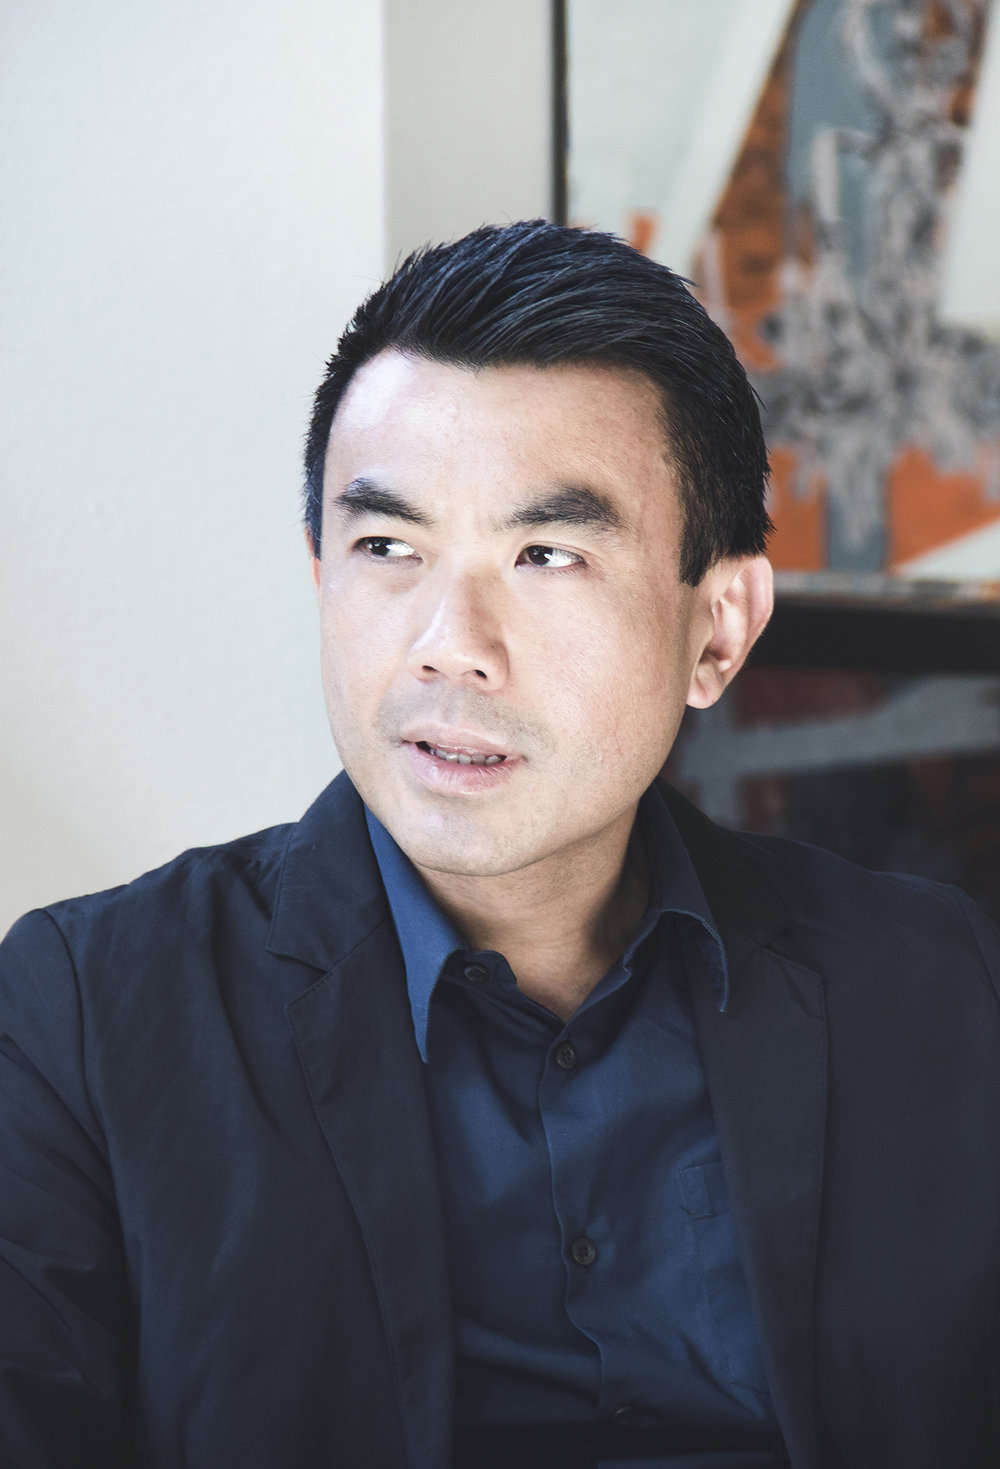 Eugene Tan (direktør, National Gallery Singapore) | Foto © I DO ART Agency.